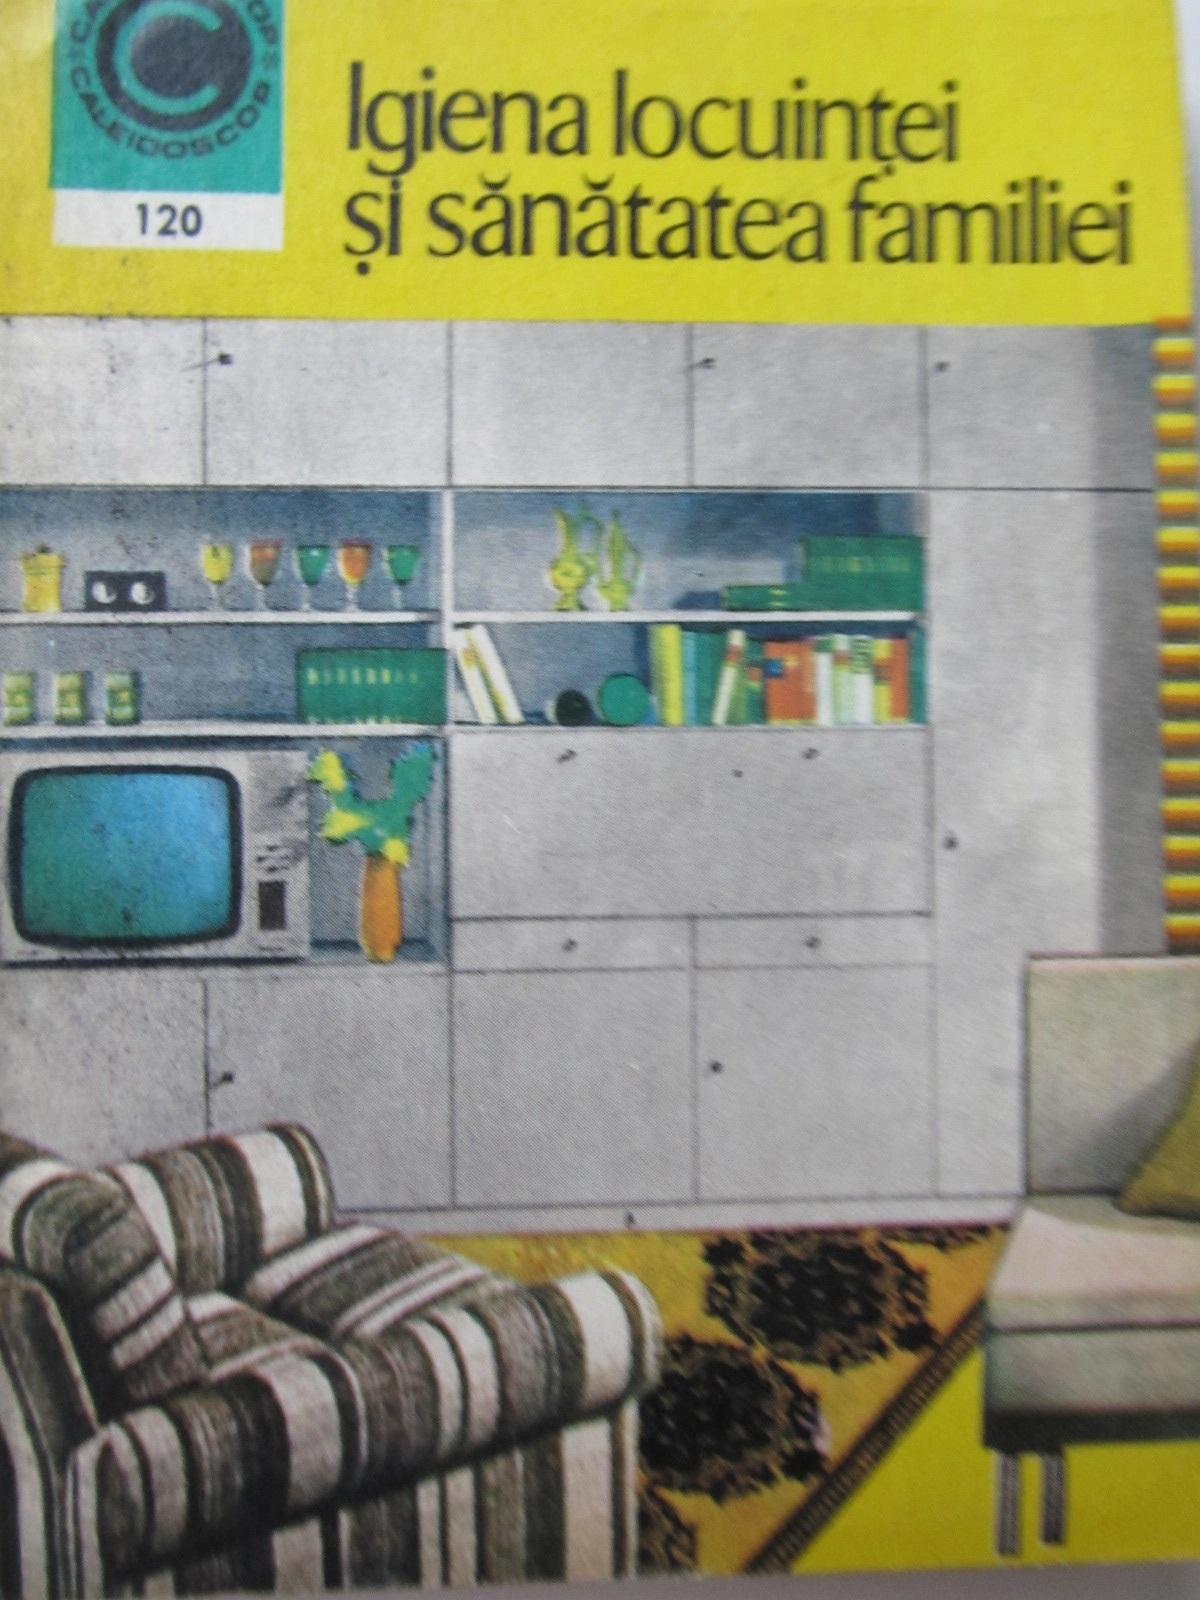 Igiena locuintei si sanatatea familiei (120) - Elena Barnea | Detalii carte